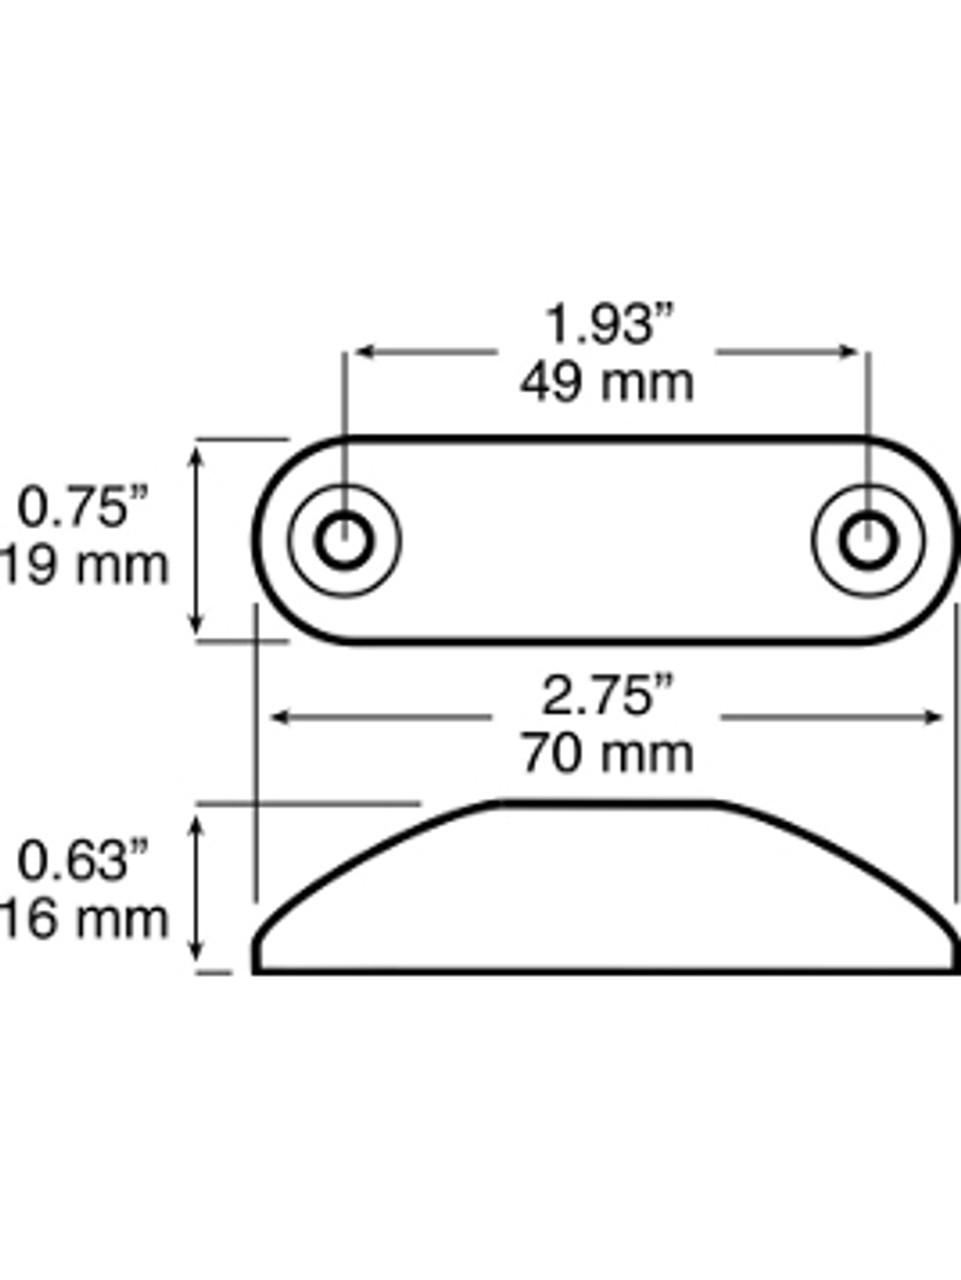 LED168A2 --- Peterson Piranha® Slim-Line Mini LED Clearance/Side Marker